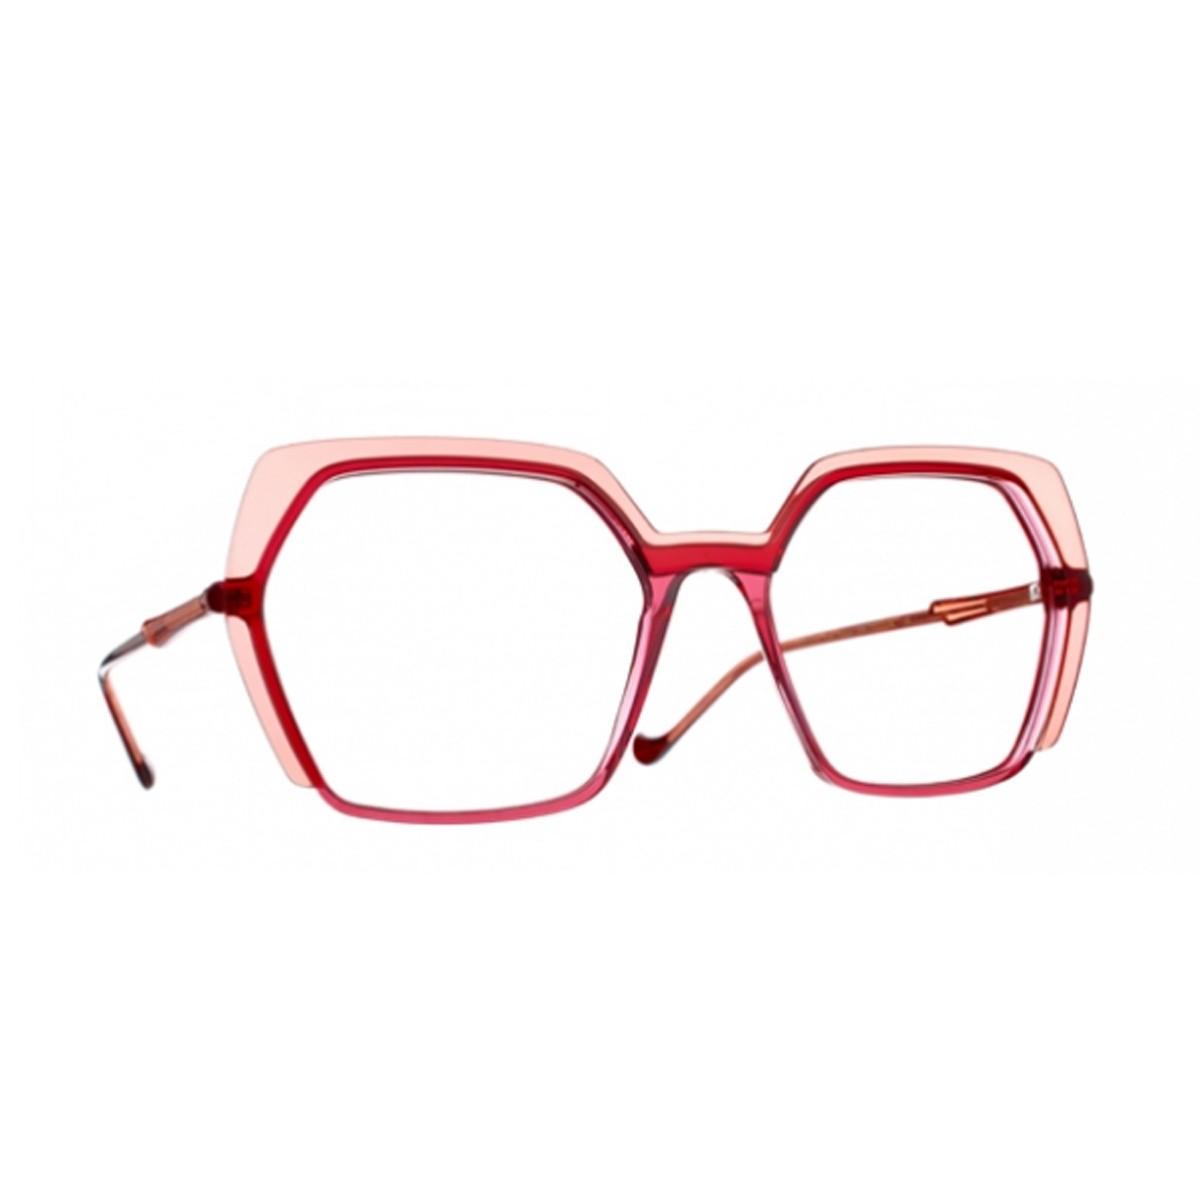 Carolin Abram Edith | Women's eyeglasses